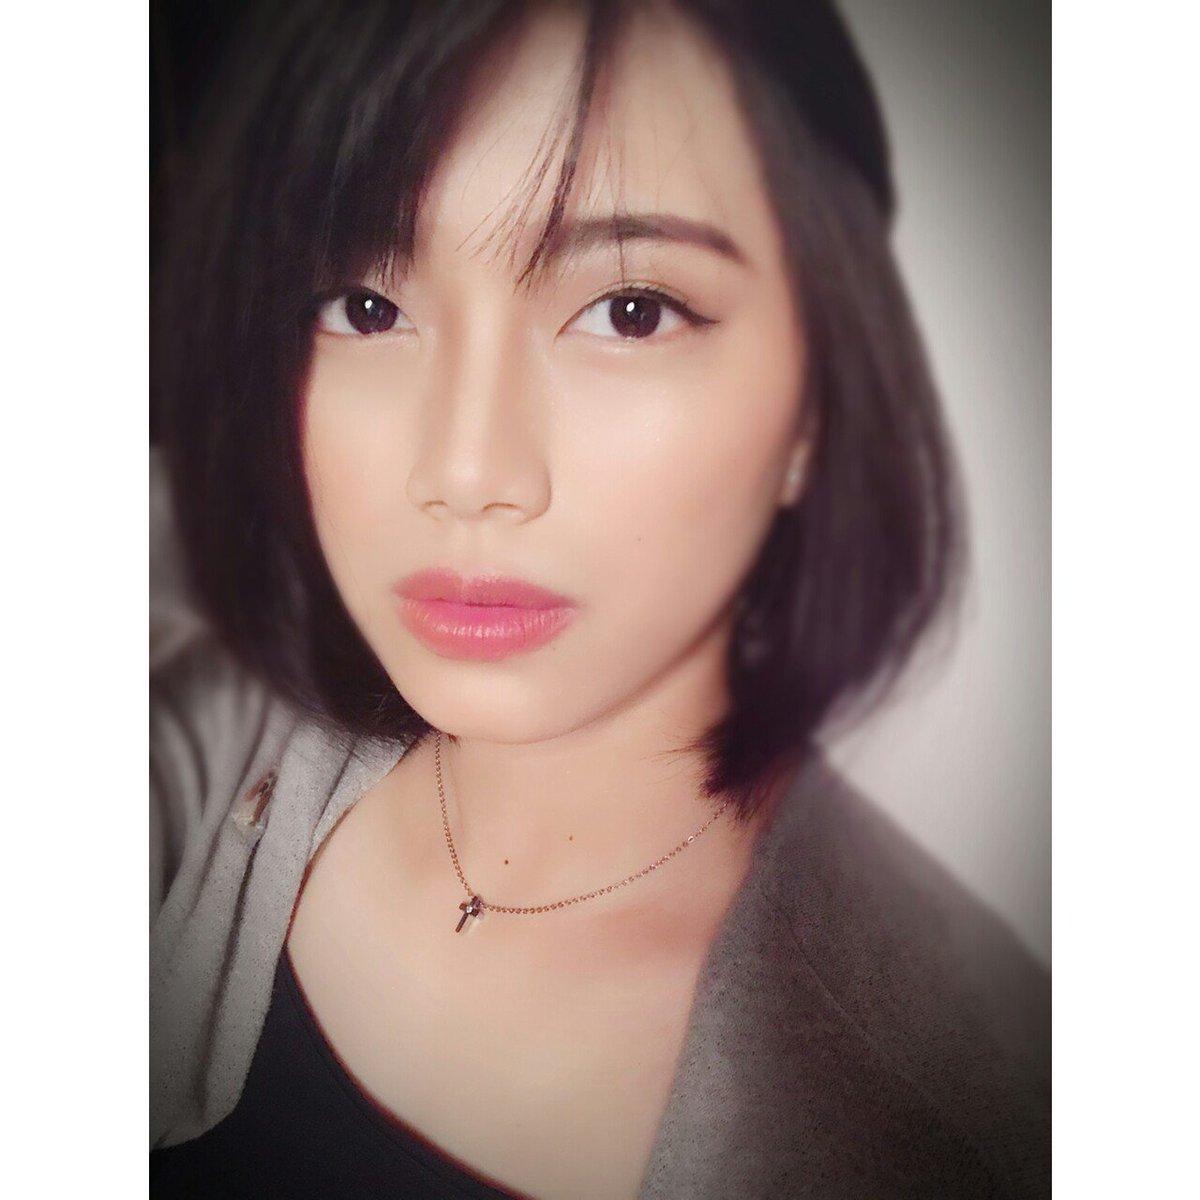 Maria Genoveva Natalia Desy Purnamasari Gunawan